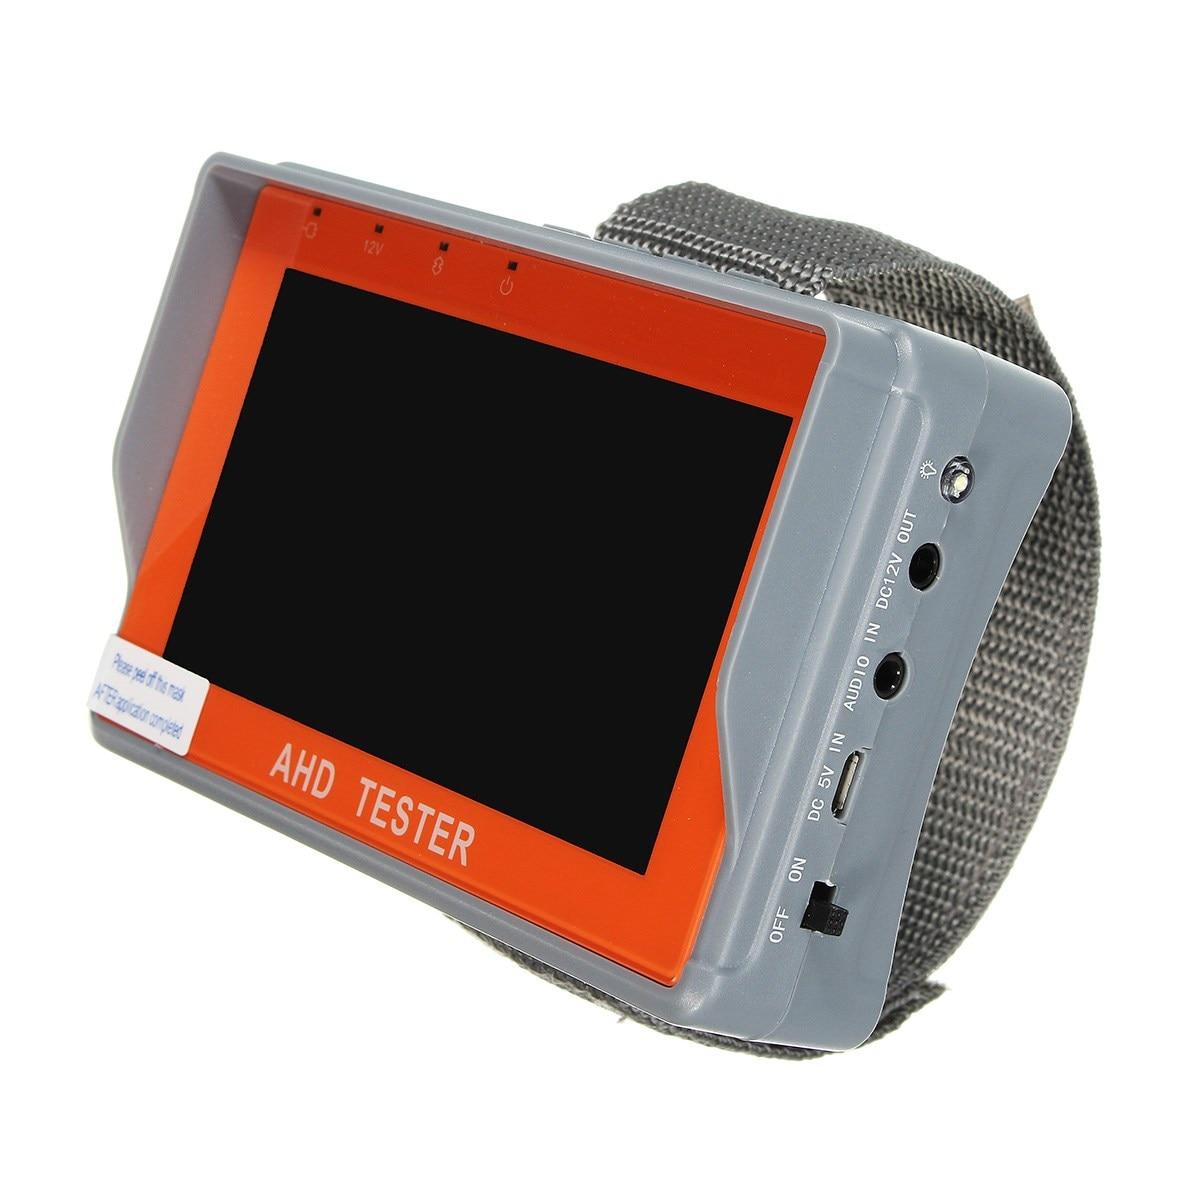 все цены на Safurance 4.3 inch TFT LCD HD CCTV AHD Tester Monitor Analog Camera UTP Cable PTZ 12V Home Security онлайн